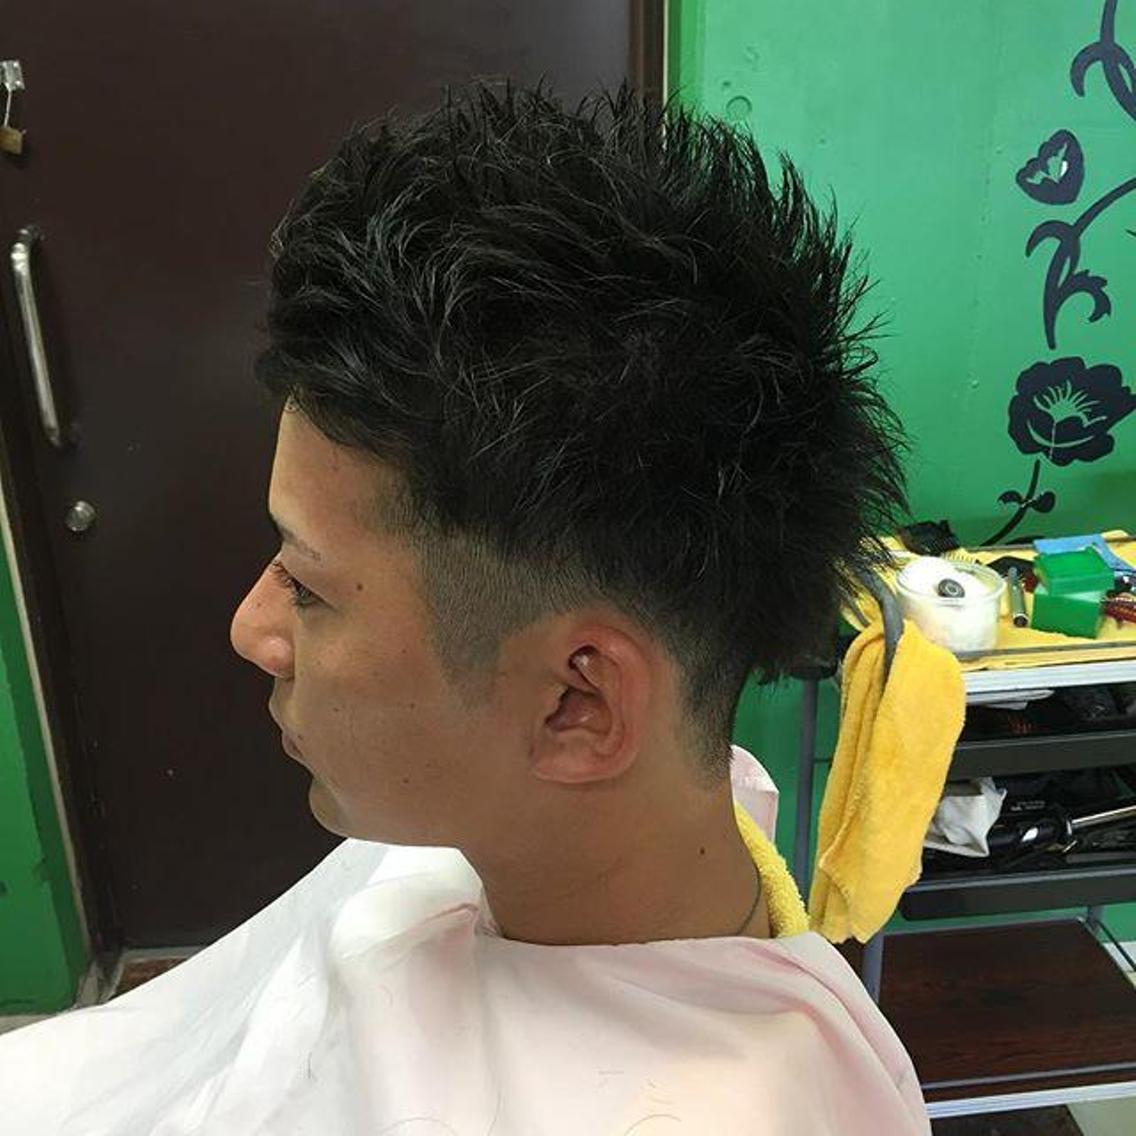 THE HAIR NO1-CLUb所属・荒井健寿の掲載